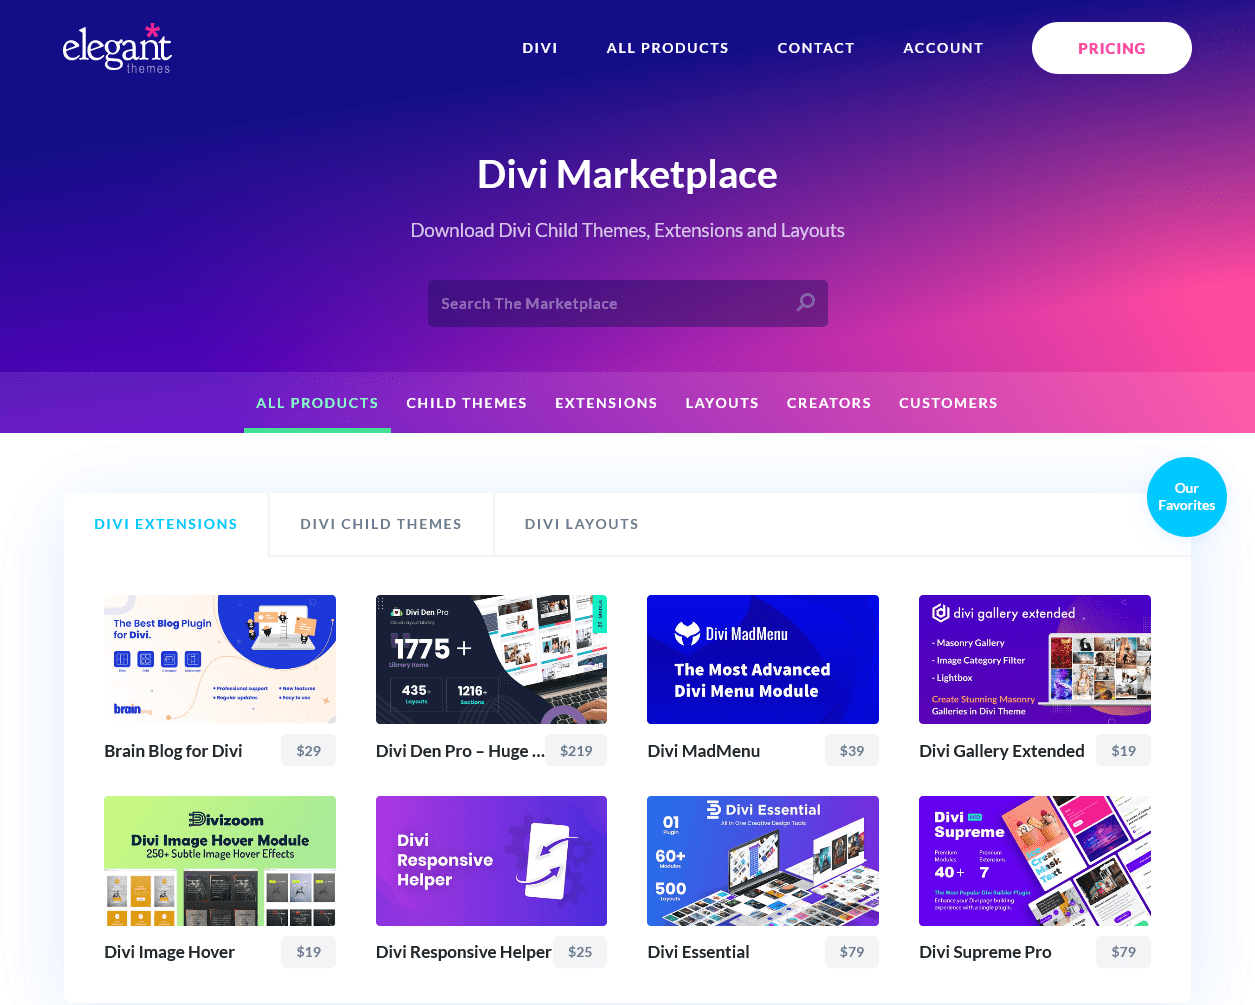 The Divi marketplace